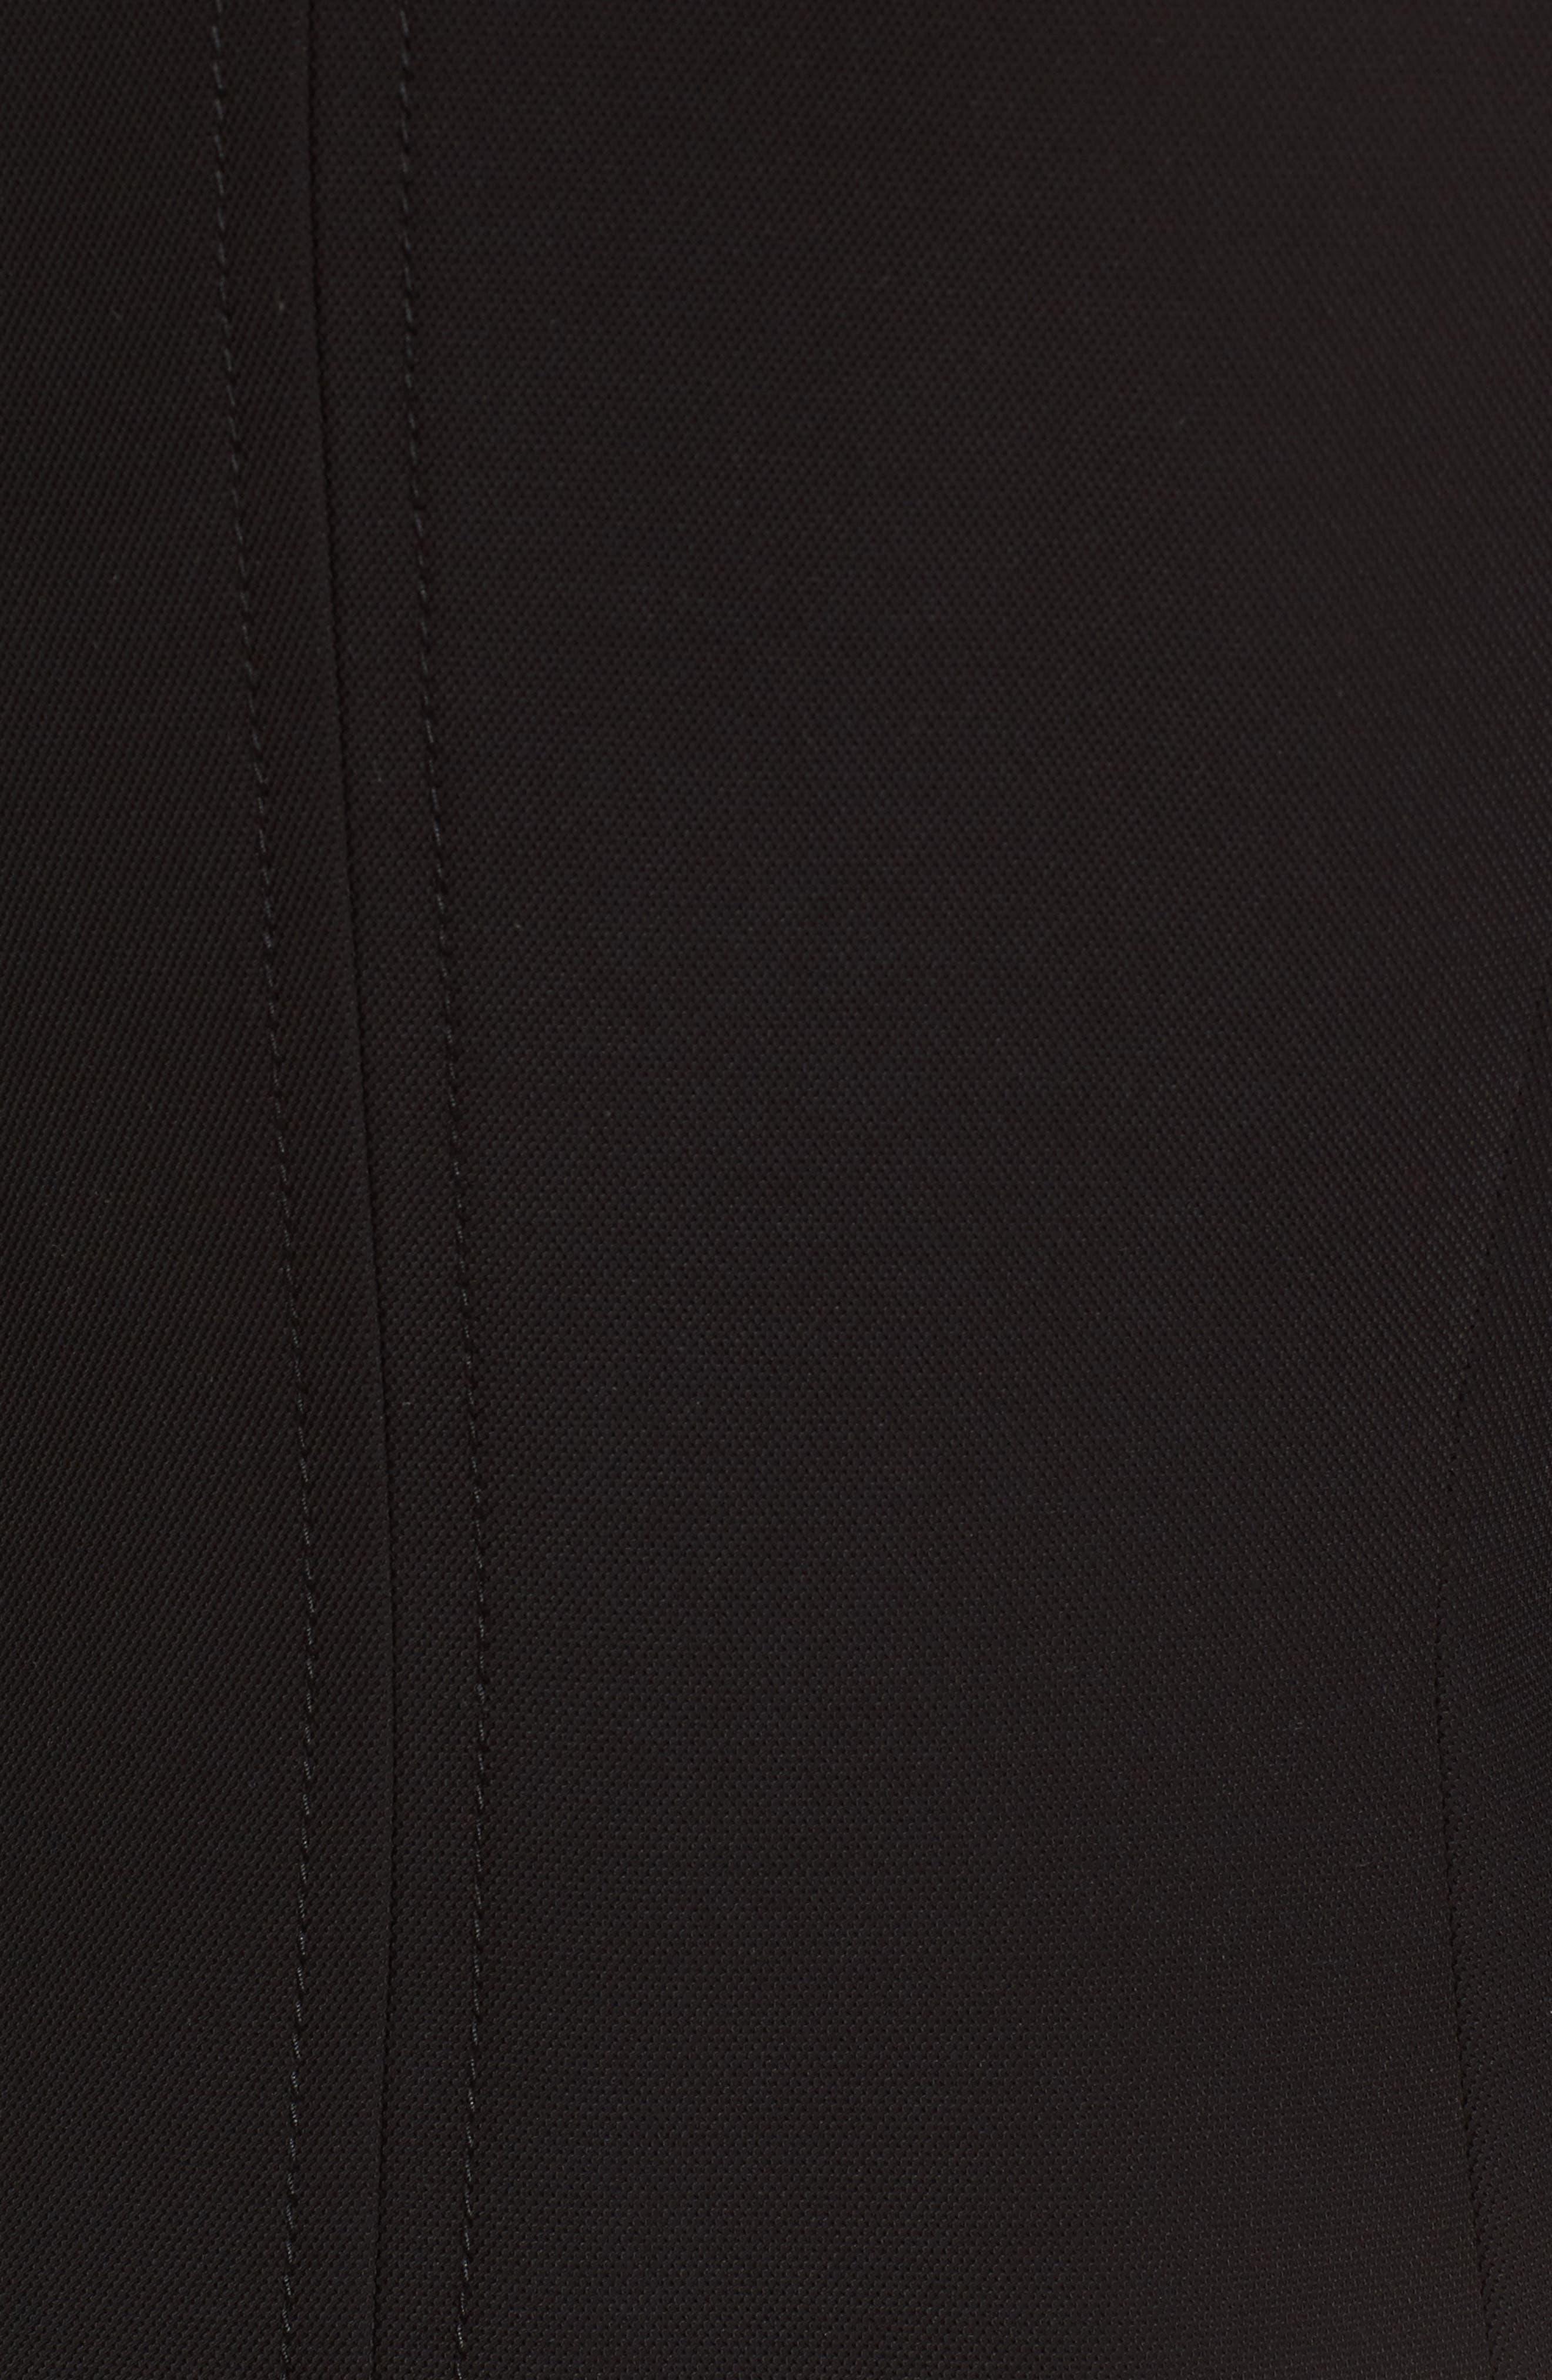 Juriona Crop Jacket,                             Alternate thumbnail 5, color,                             Black